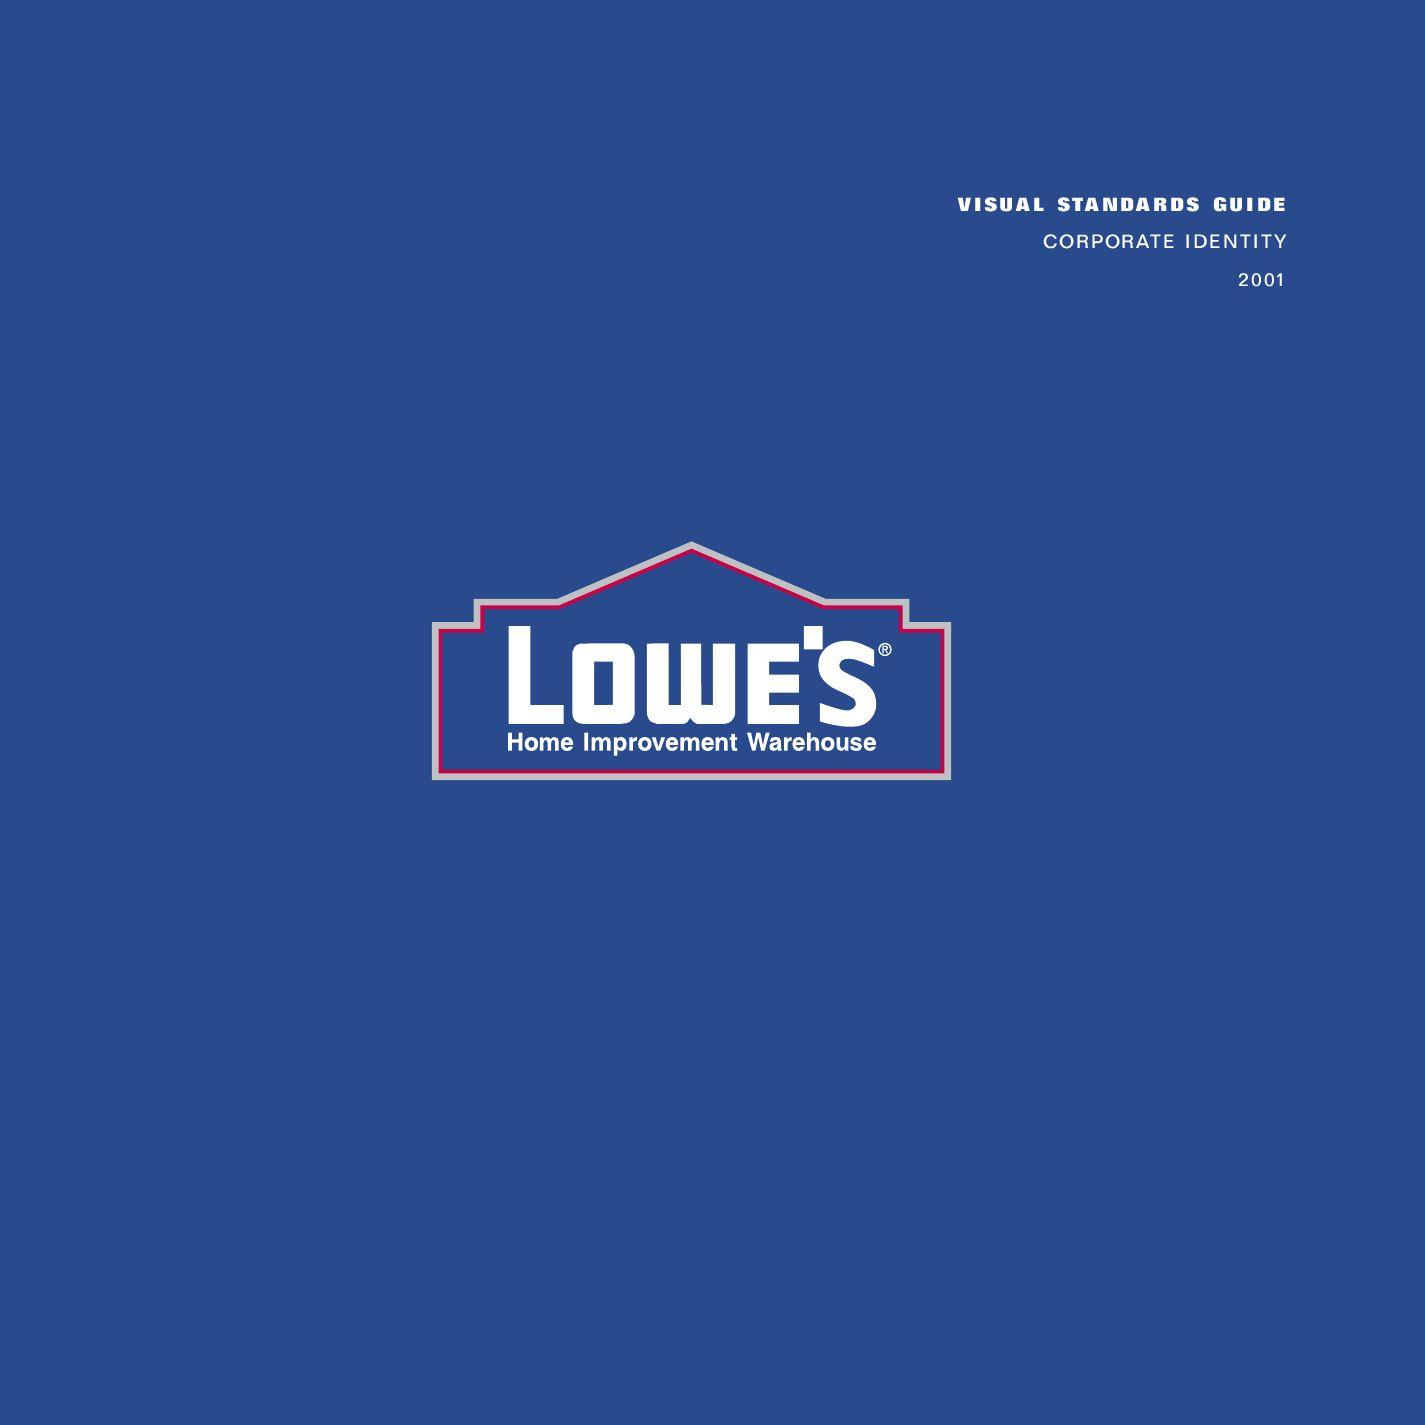 Lowes Corporate Identity Brandbook By Gabychev Alex Issuu